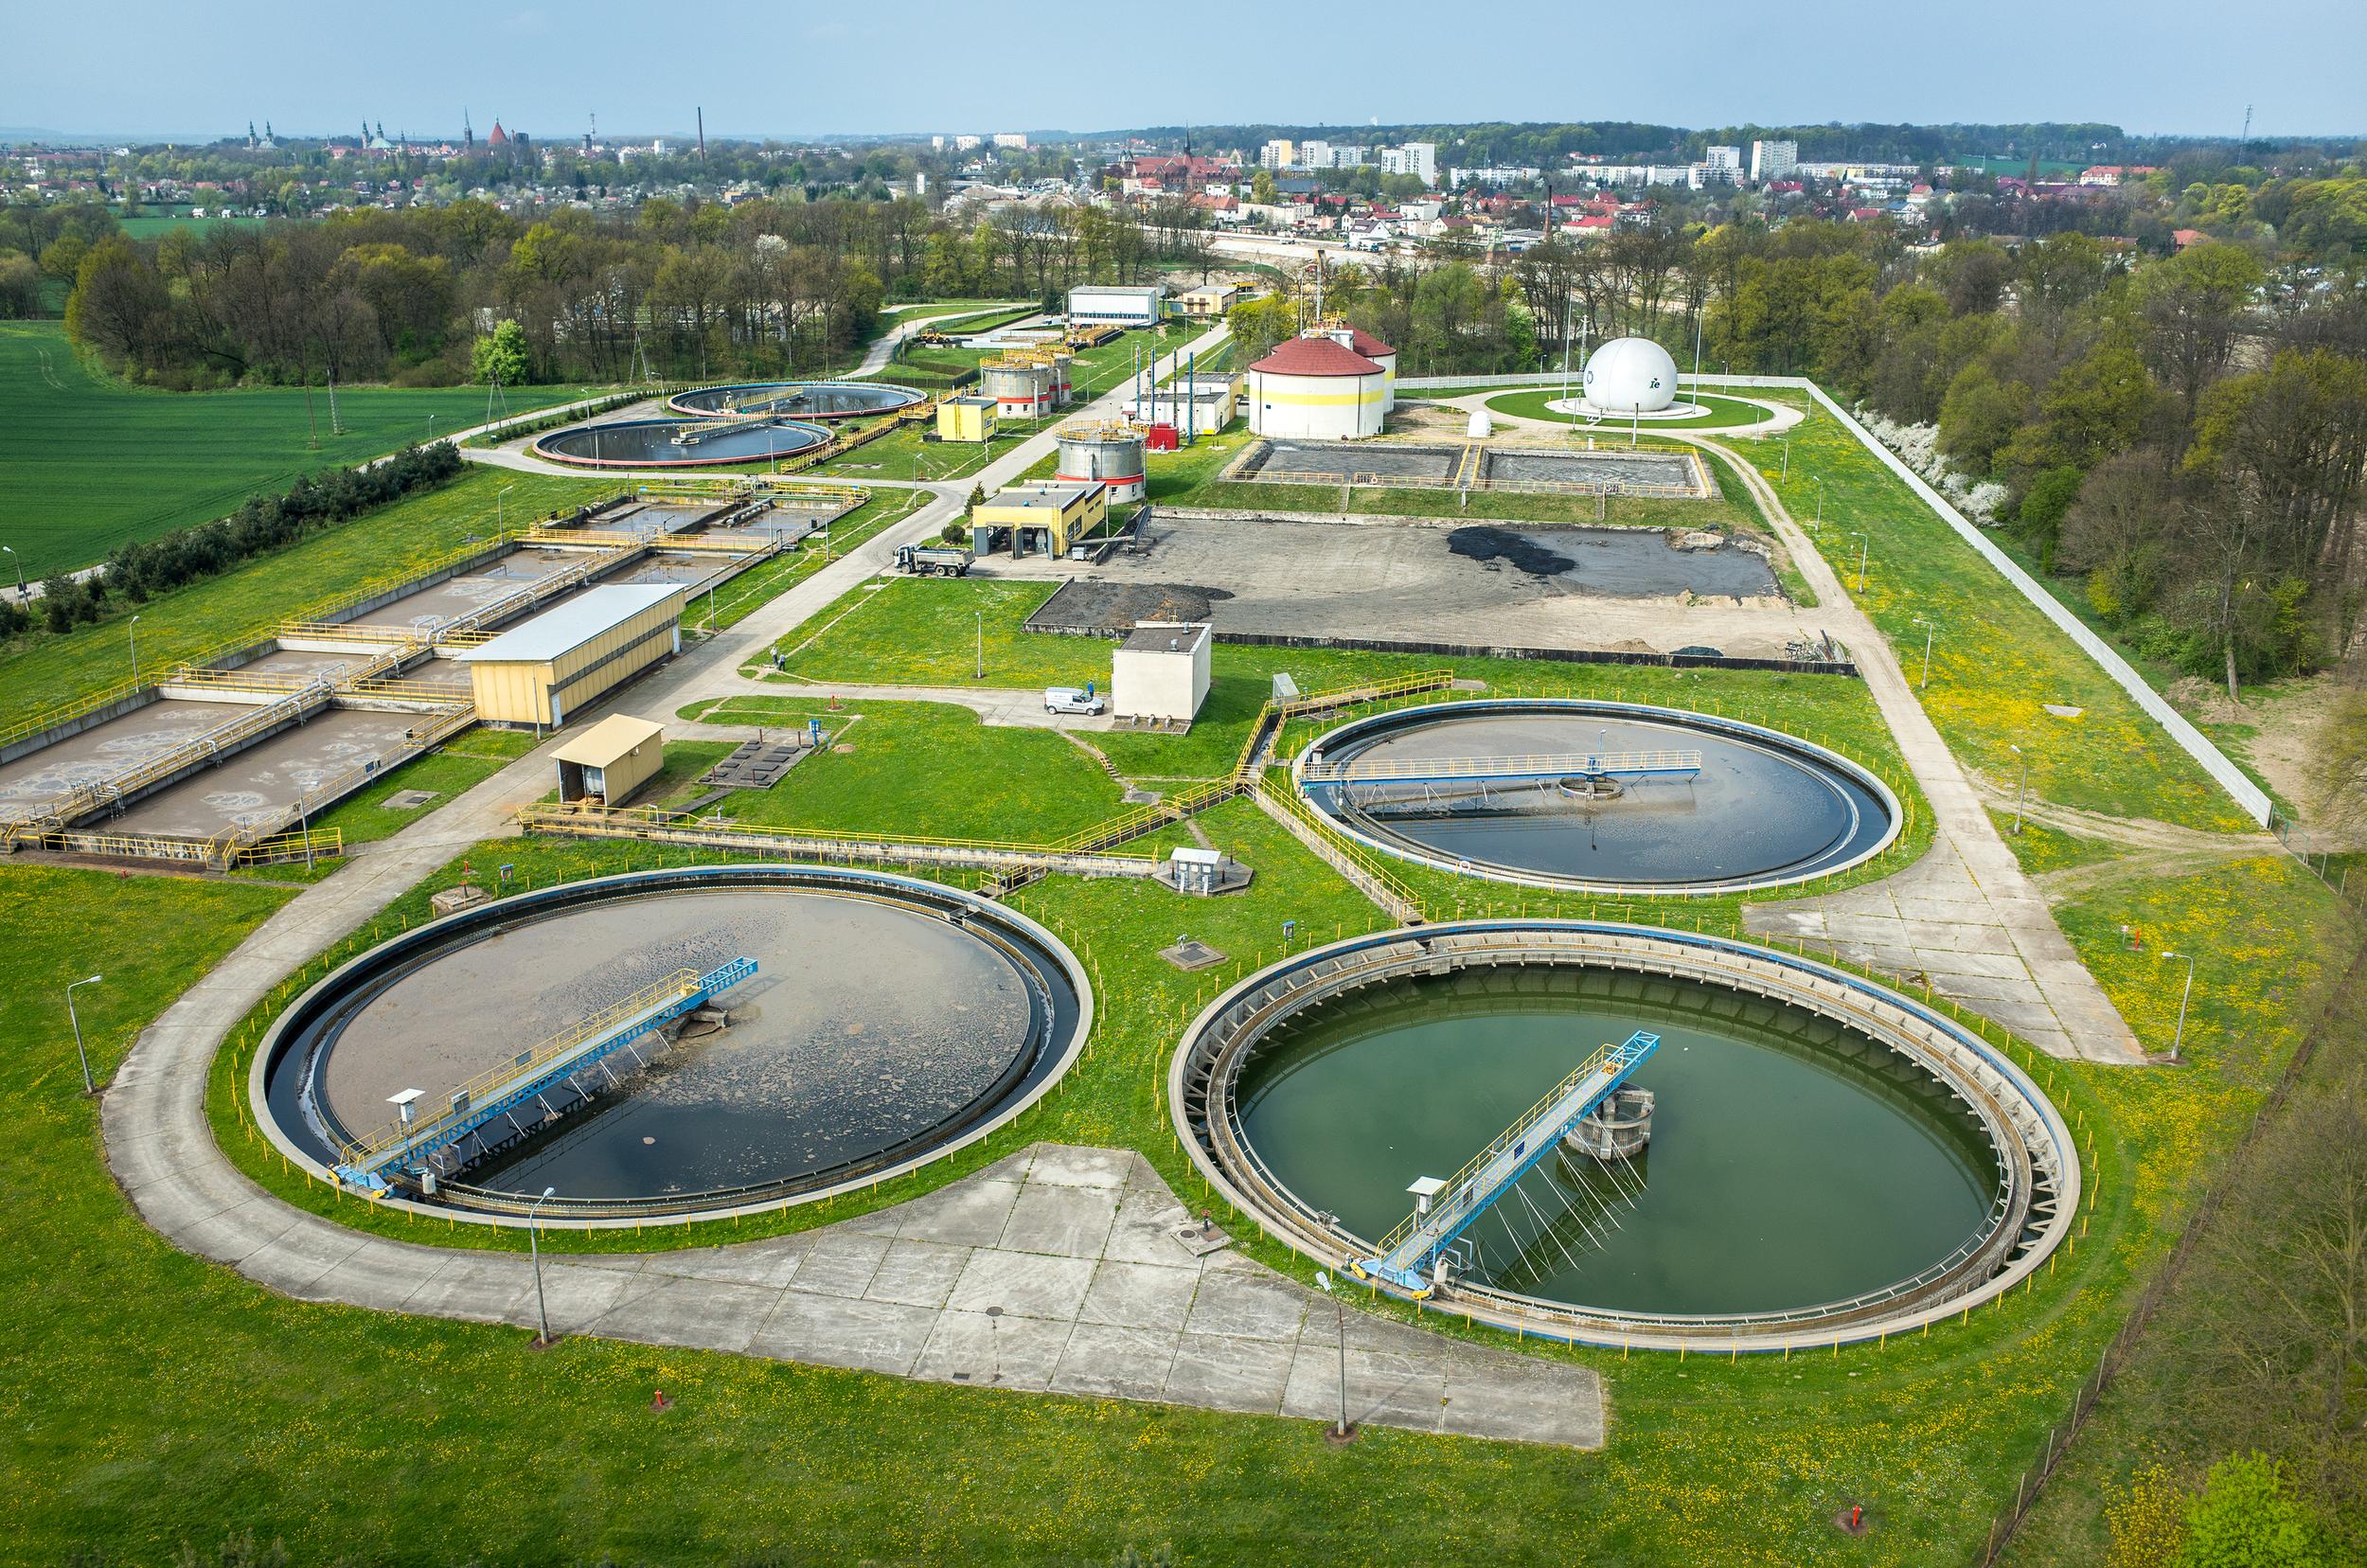 bigstock-Sewage-Treatment-Plant-92319107.jpg